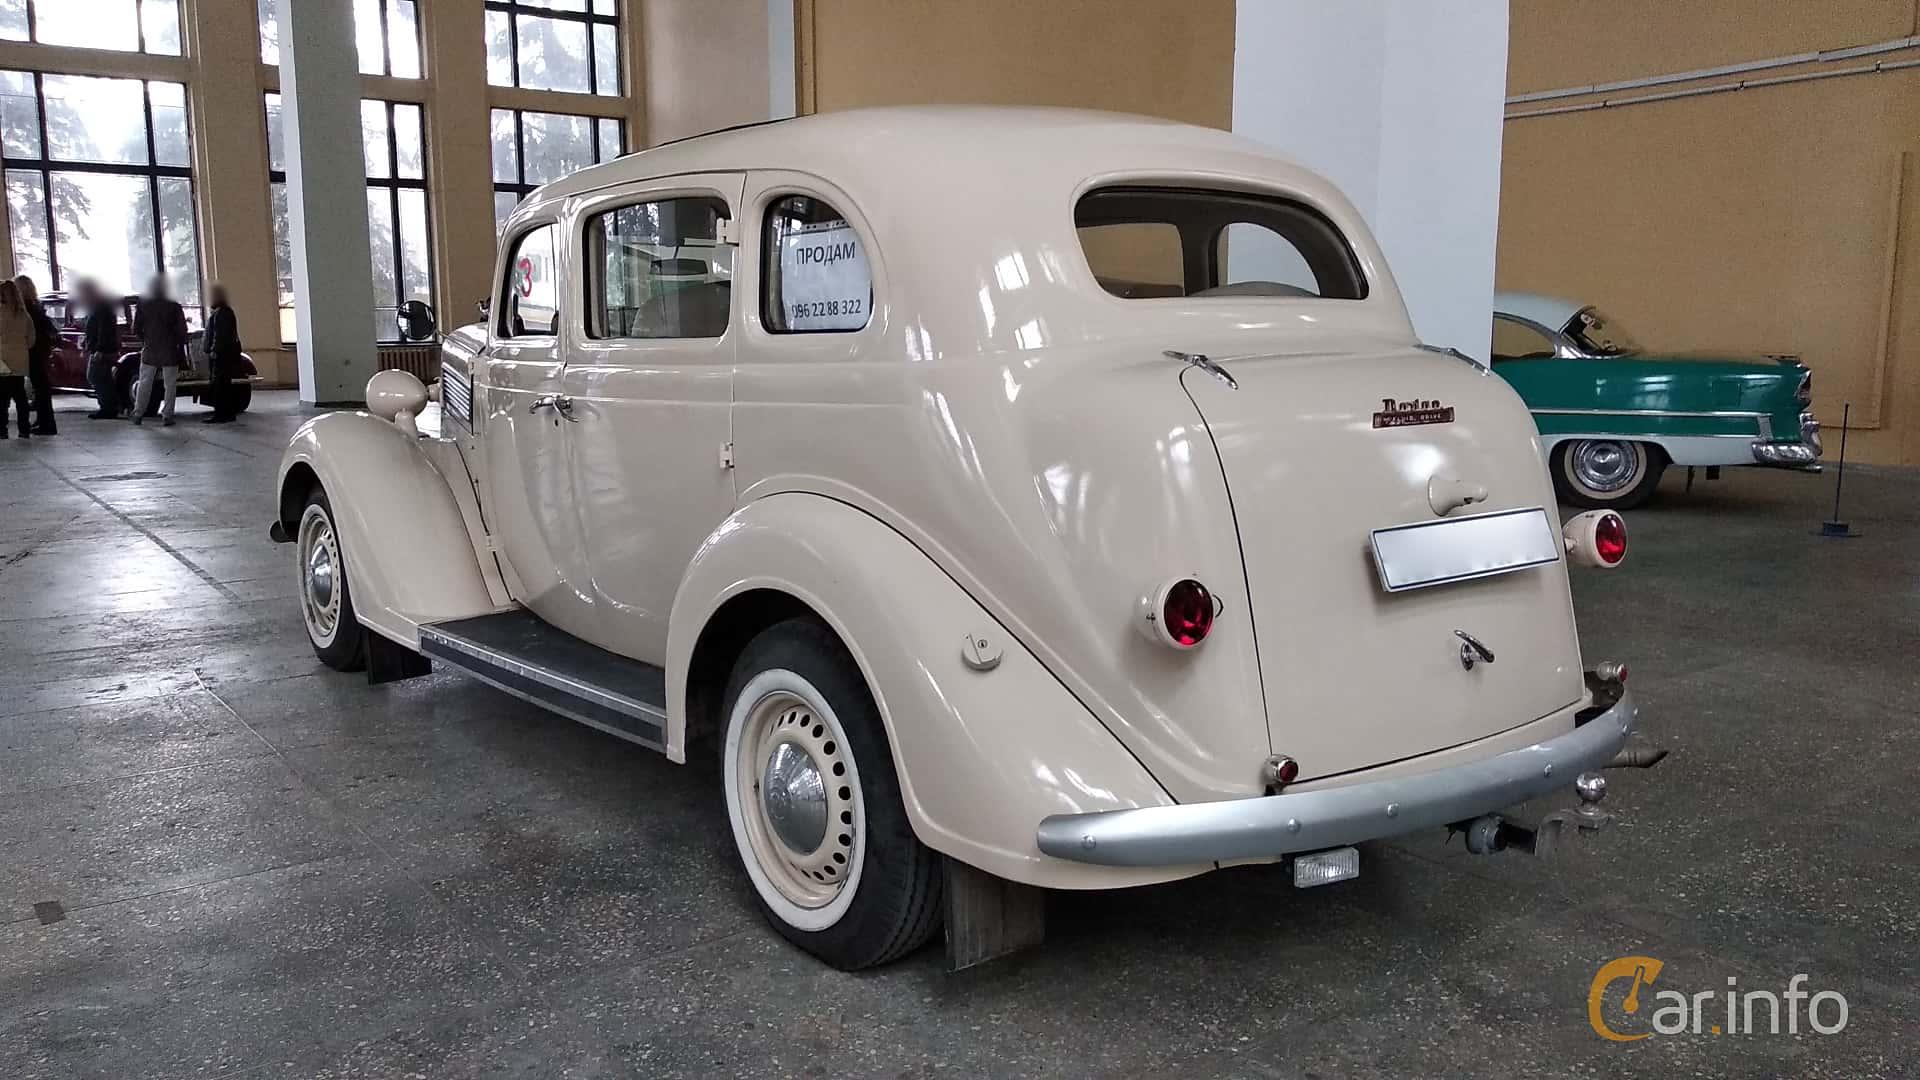 Dodge Beauty Winner 4-door Touring Sedan 3.6 Manual, 87hp, 1936 at Old Car Land no.2 2018